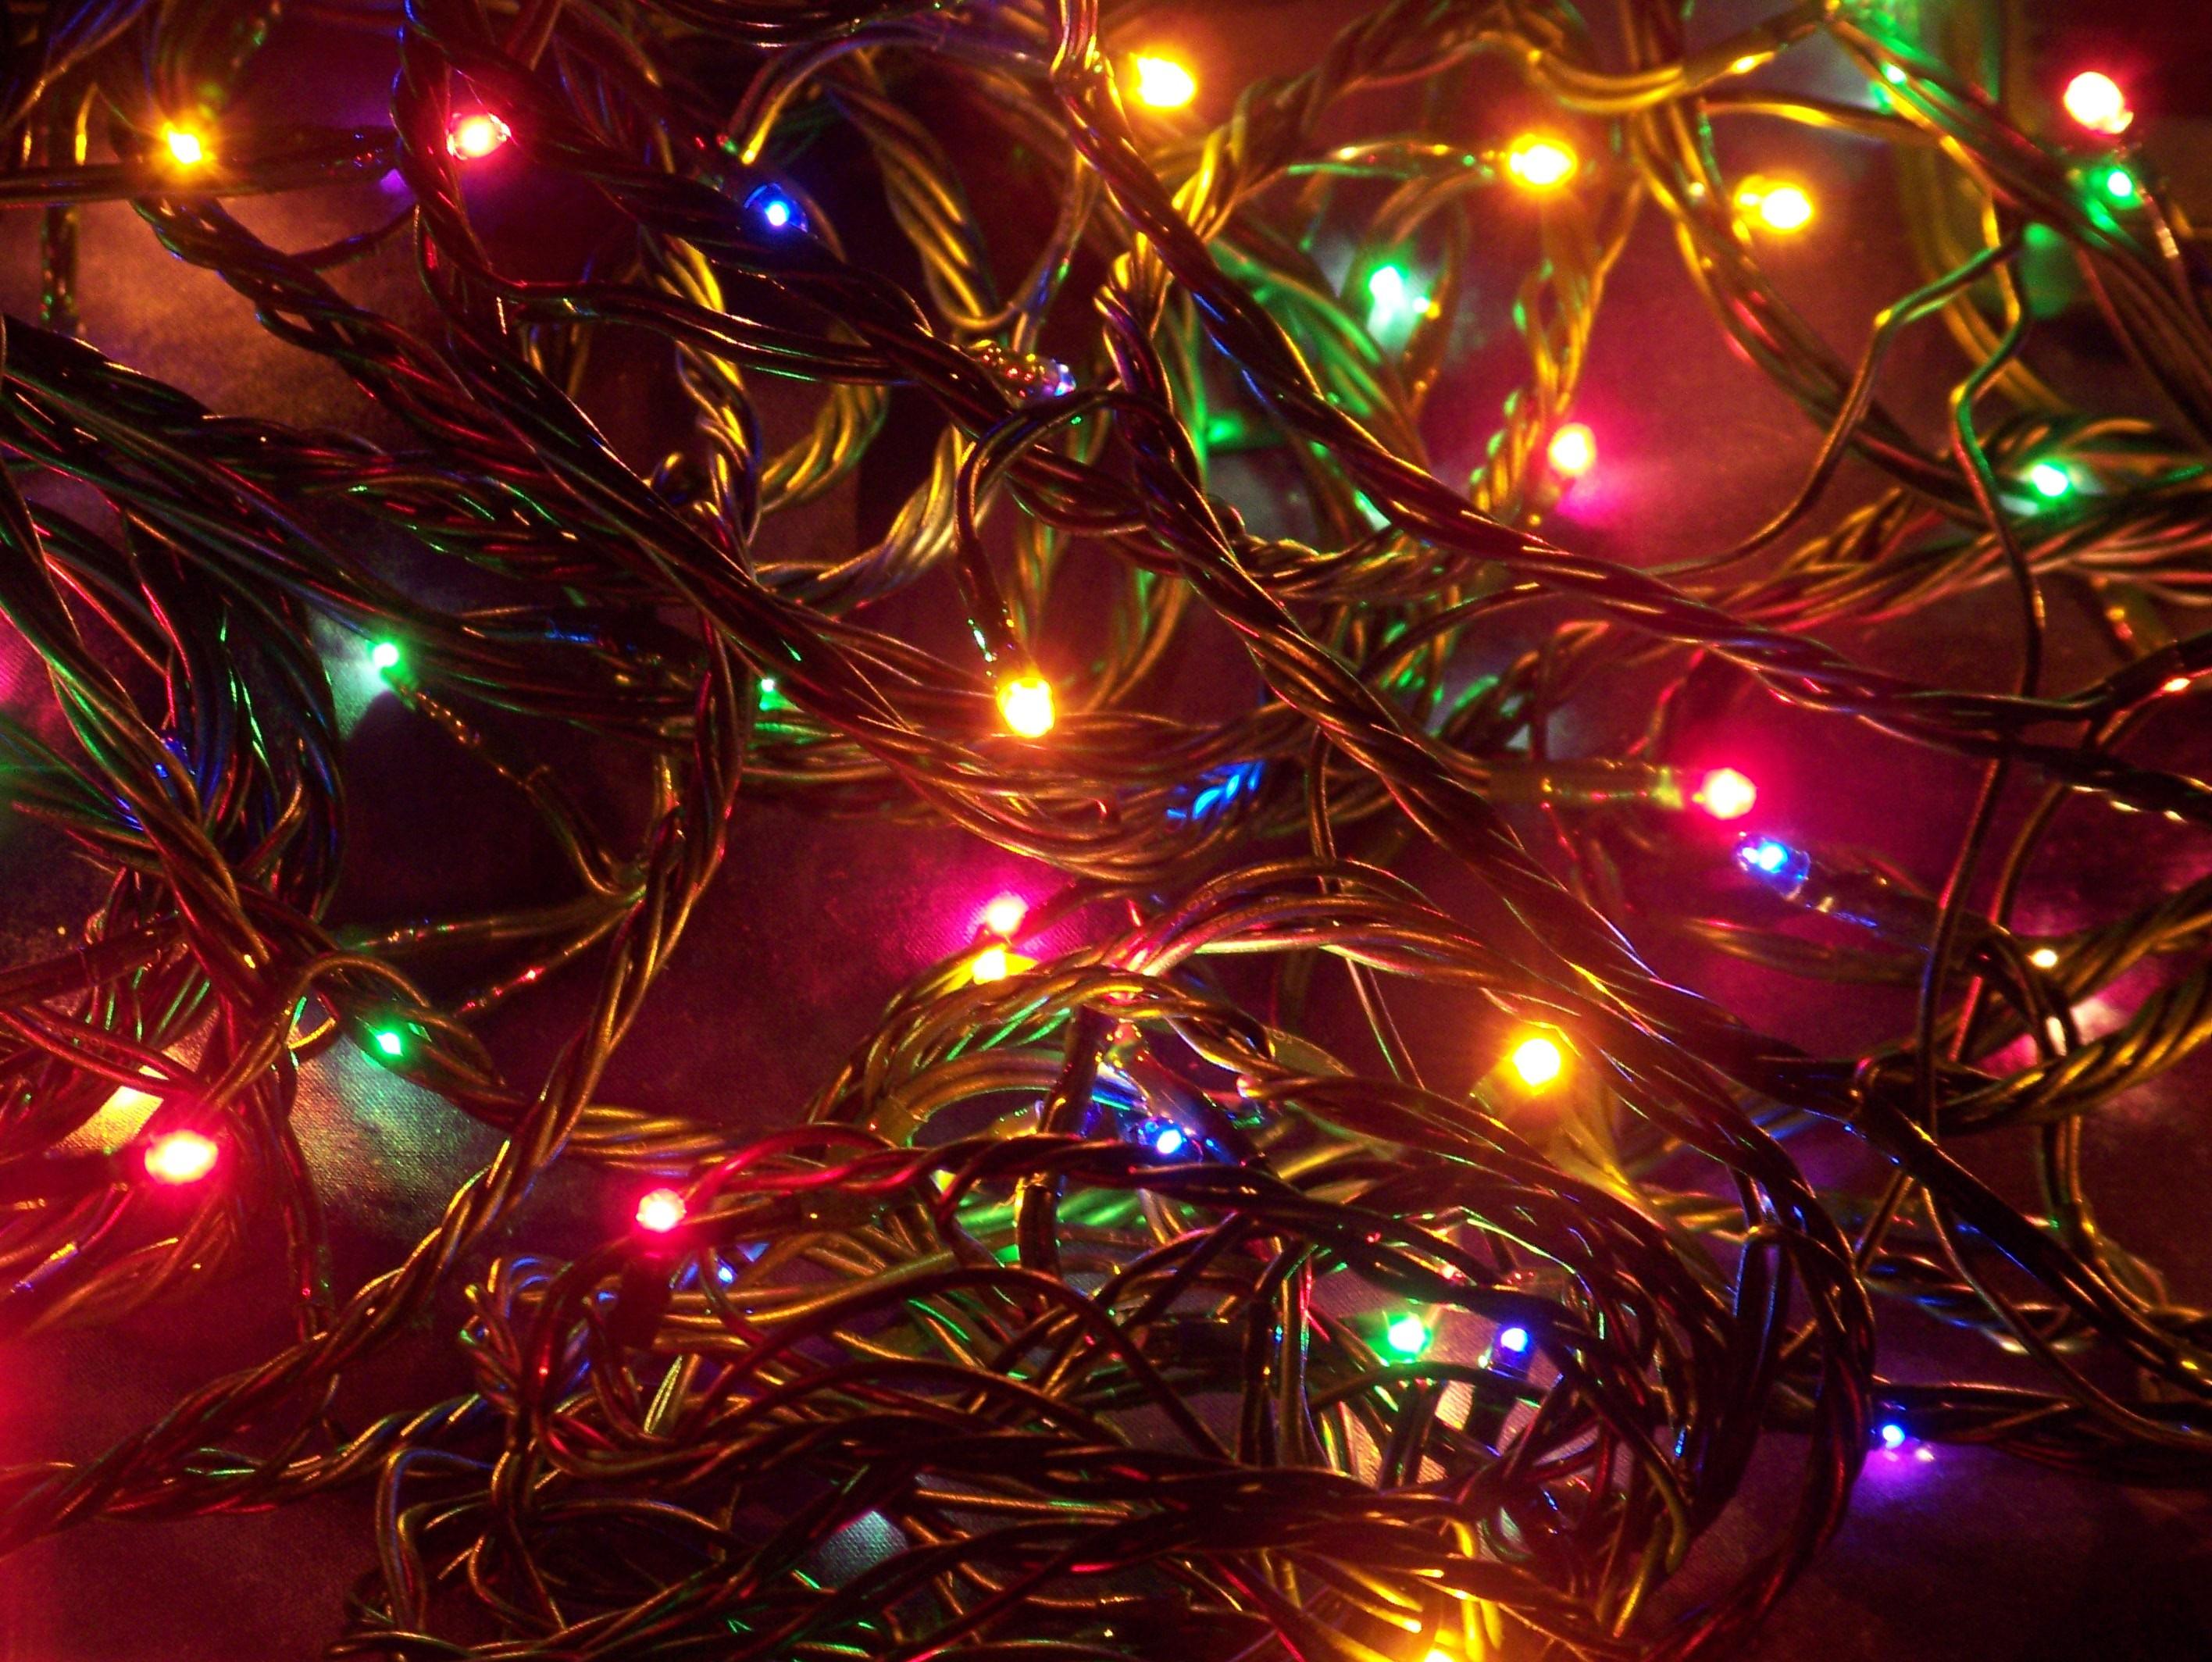 Res: 2832x2128, 2015 desktop backgrounds Christmas 1